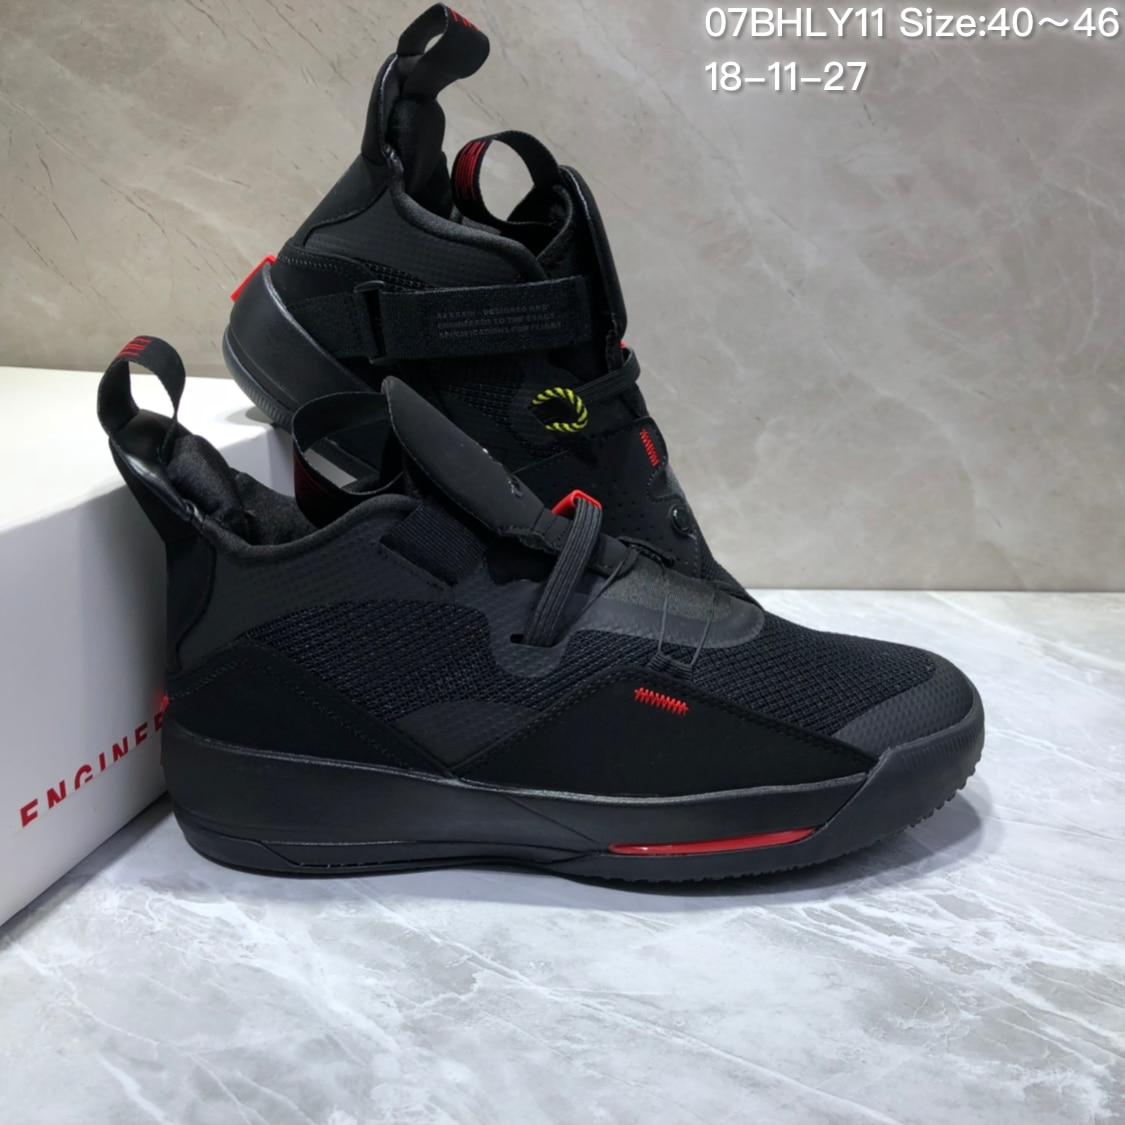 67827a8cf6b7 Hot sale Official New Arrival BALL 365 Men s Basketball Shoes Sneakers  Jordan XXXIII AJ33 chaussure homme